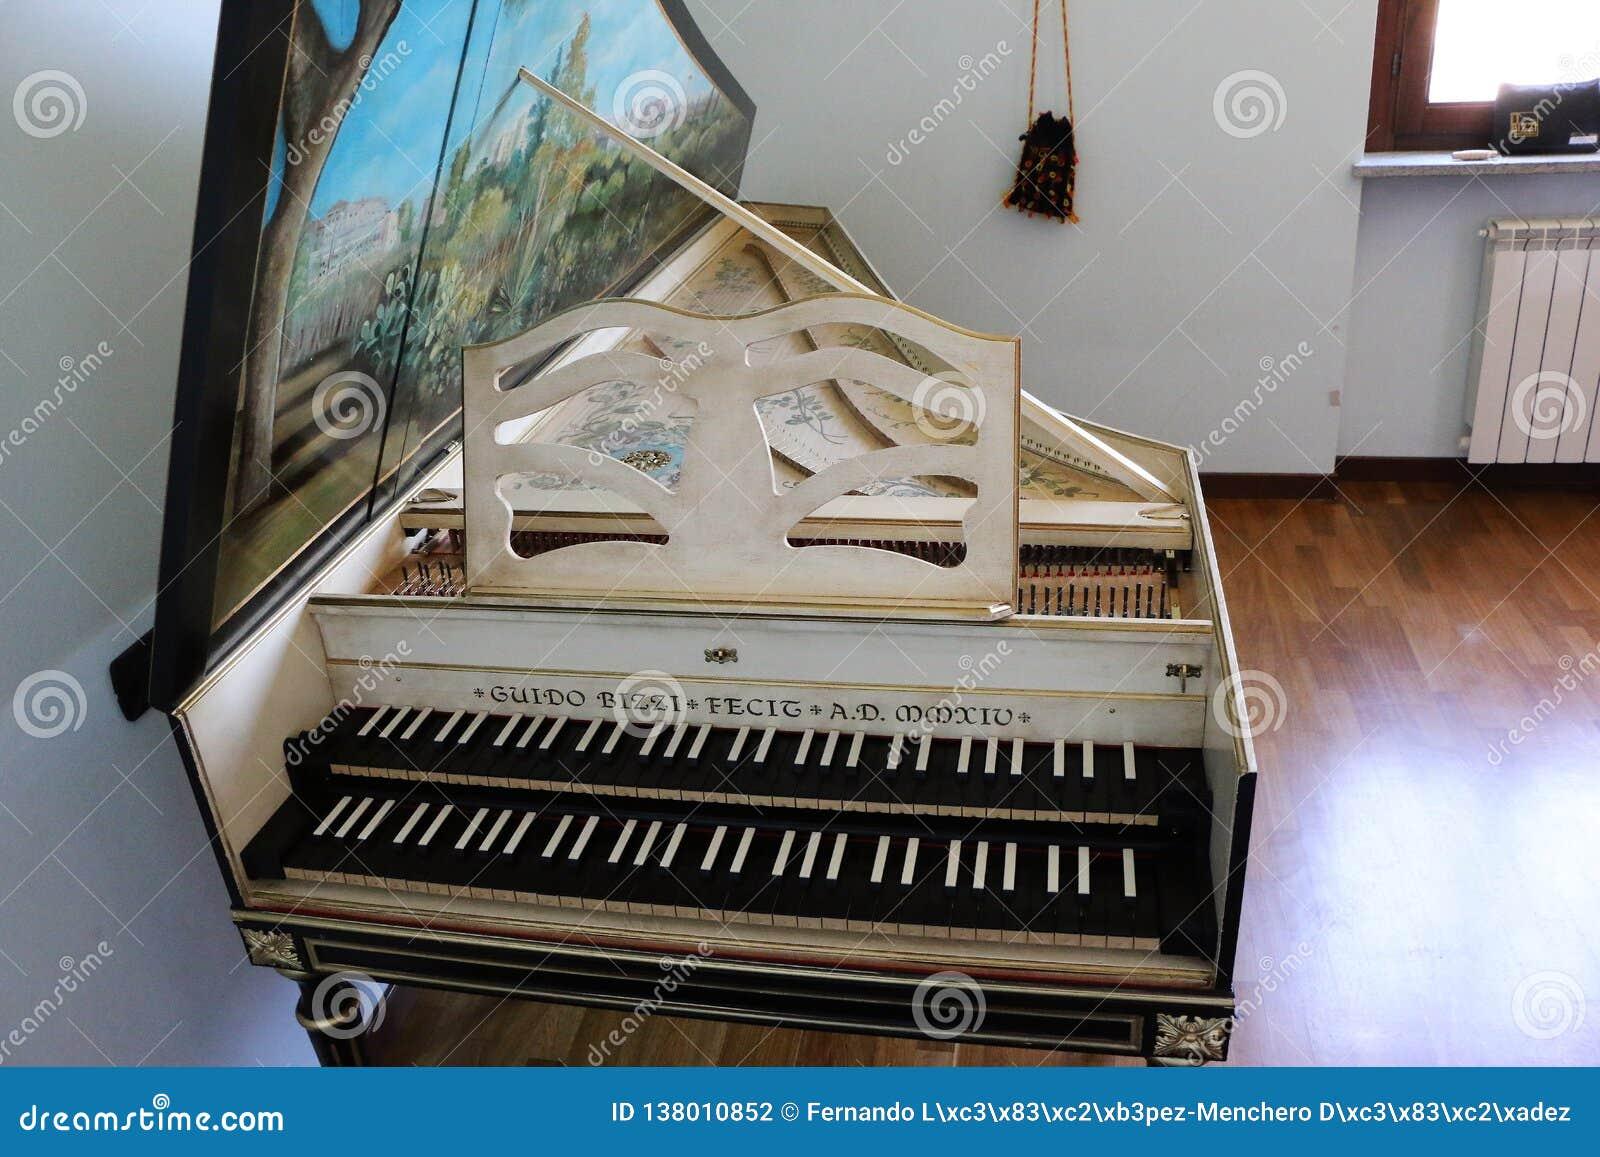 Goermans-Taskin Harpsichord overview2